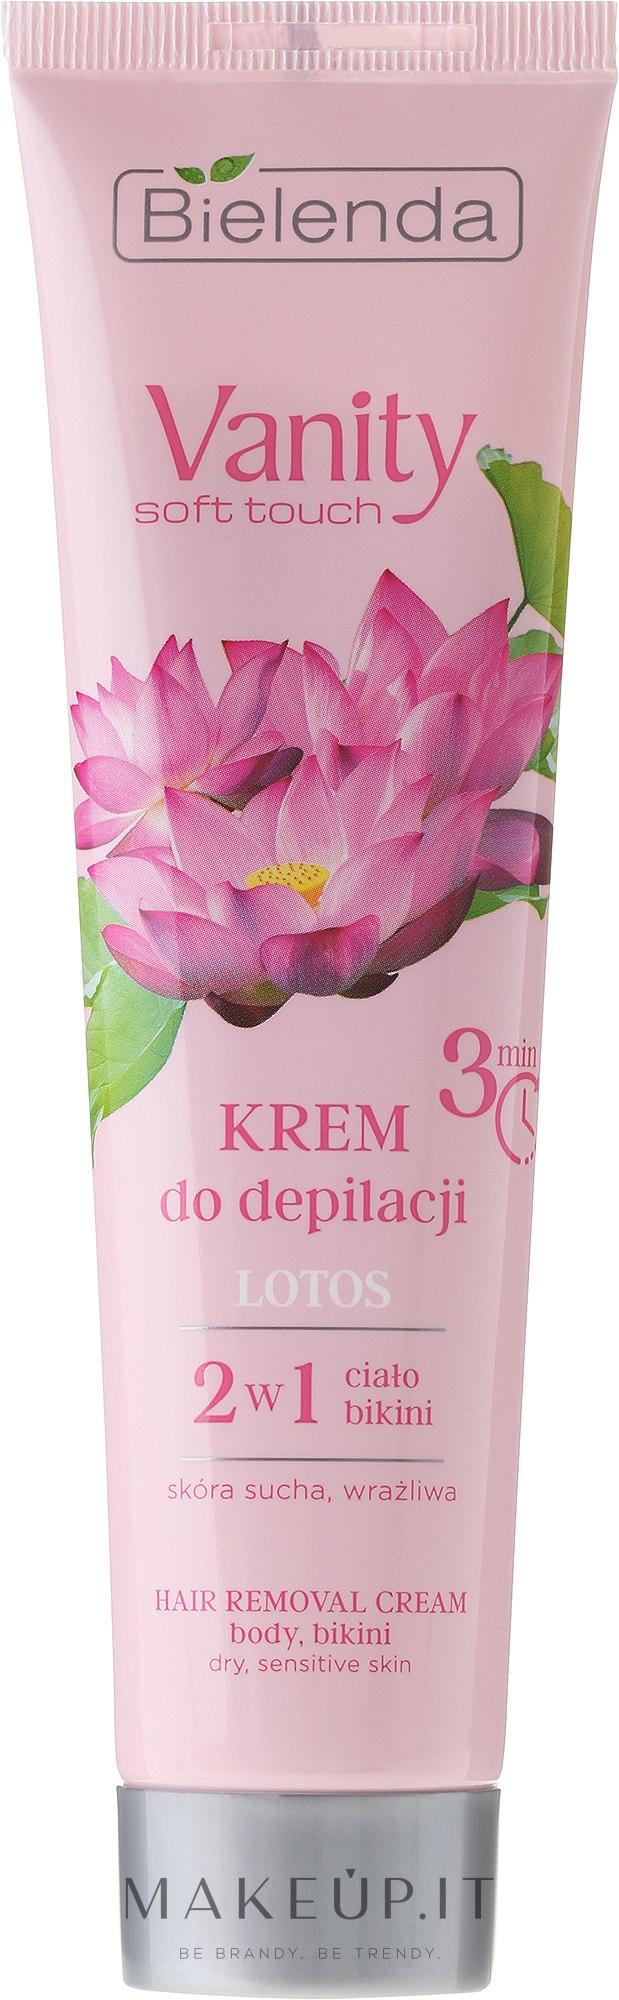 "Crema depilatoria ""Lotos"" - Bielenda Vanity Soft Touch Lotos — foto 100 ml"